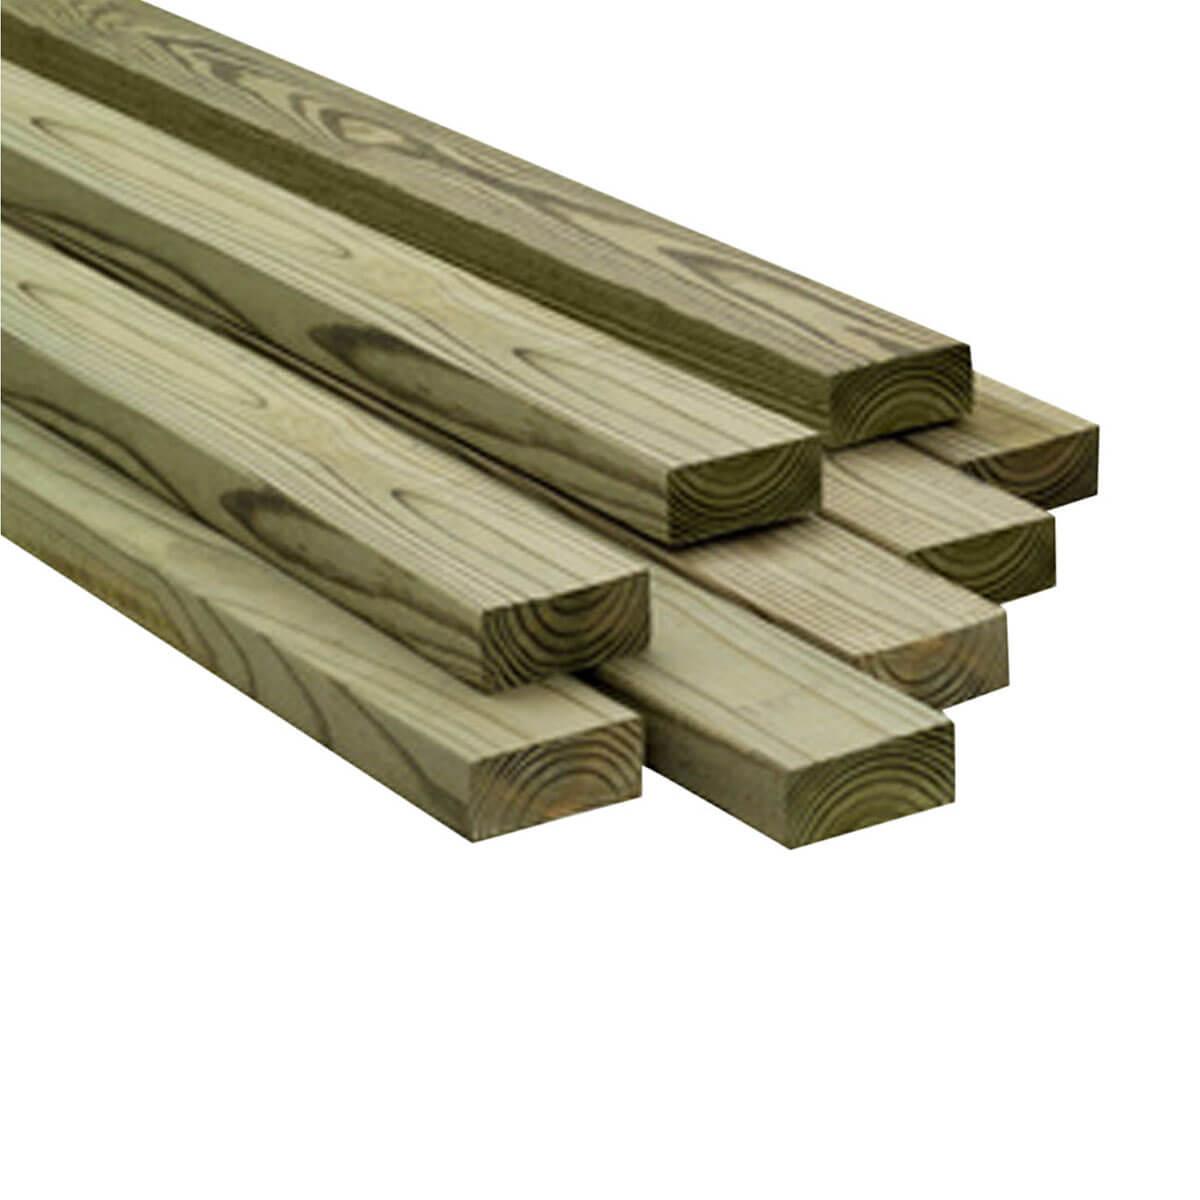 ACQ Treated Lumber - 1 x 4 x 8'